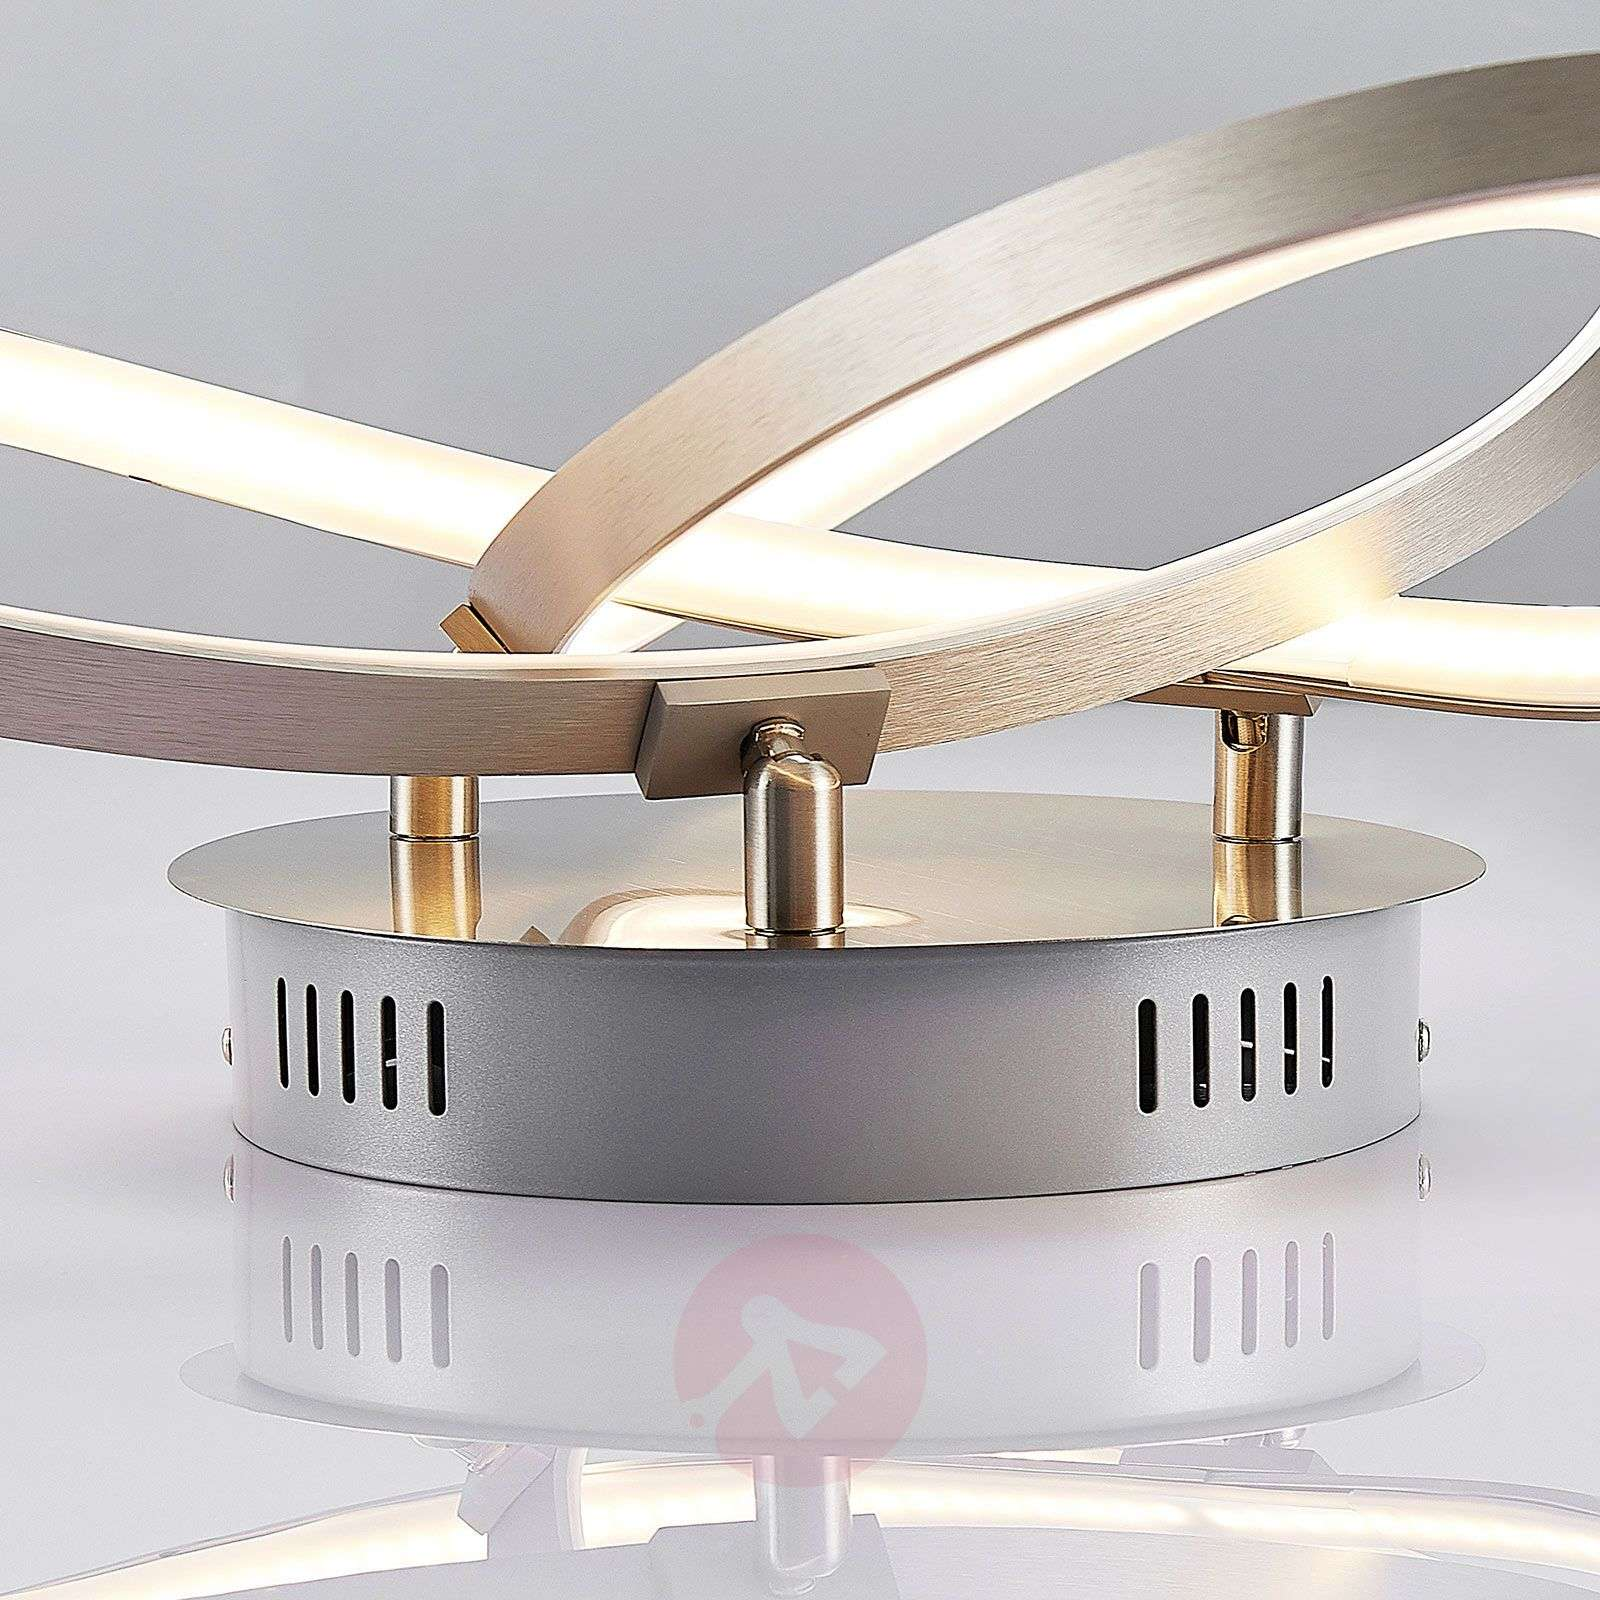 Saliha modern LED ceiling lamp-9985071-02